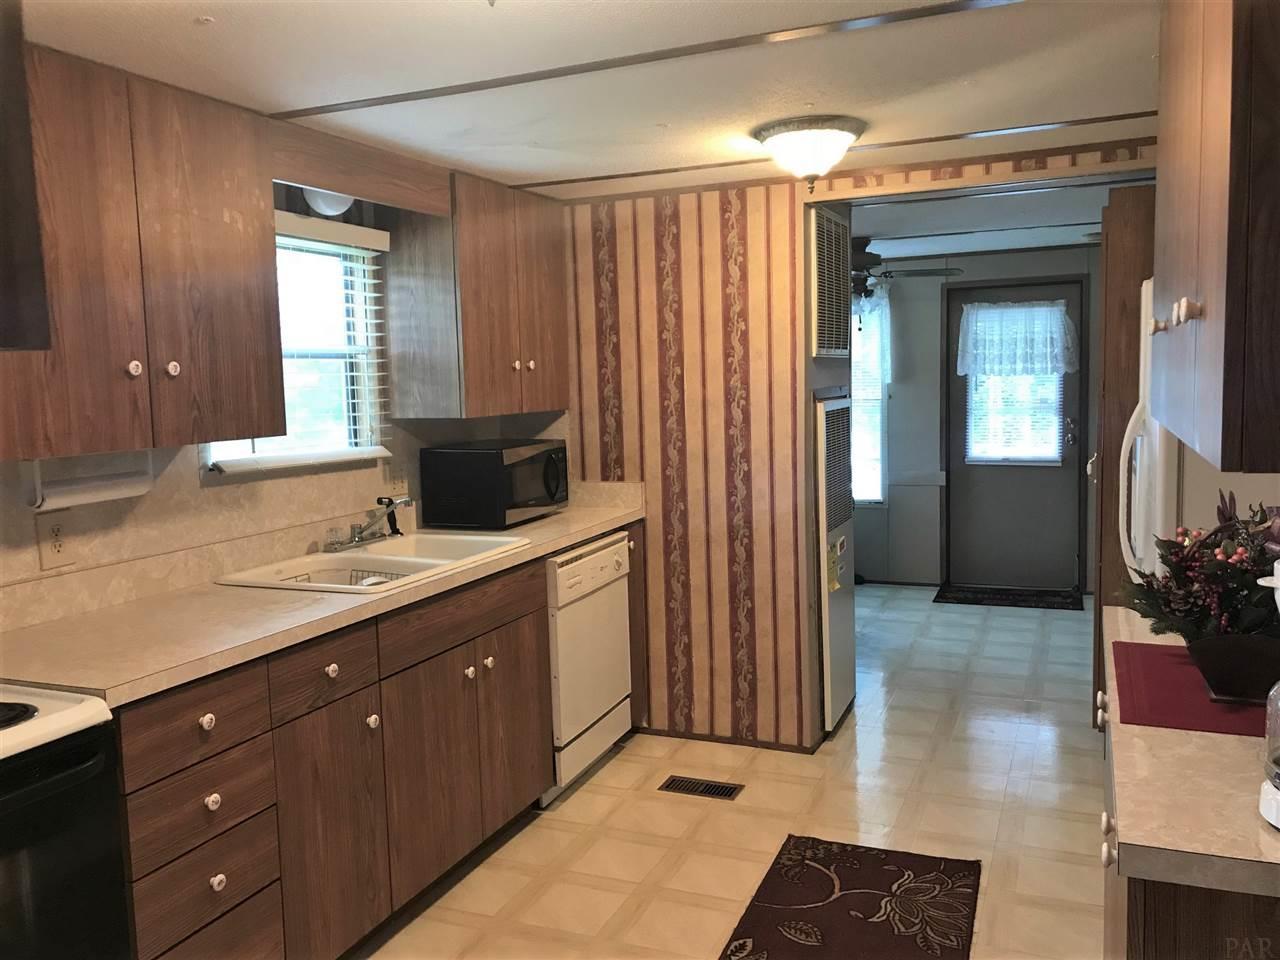 473 Crowndale Ct, Cantonment, FL 32533